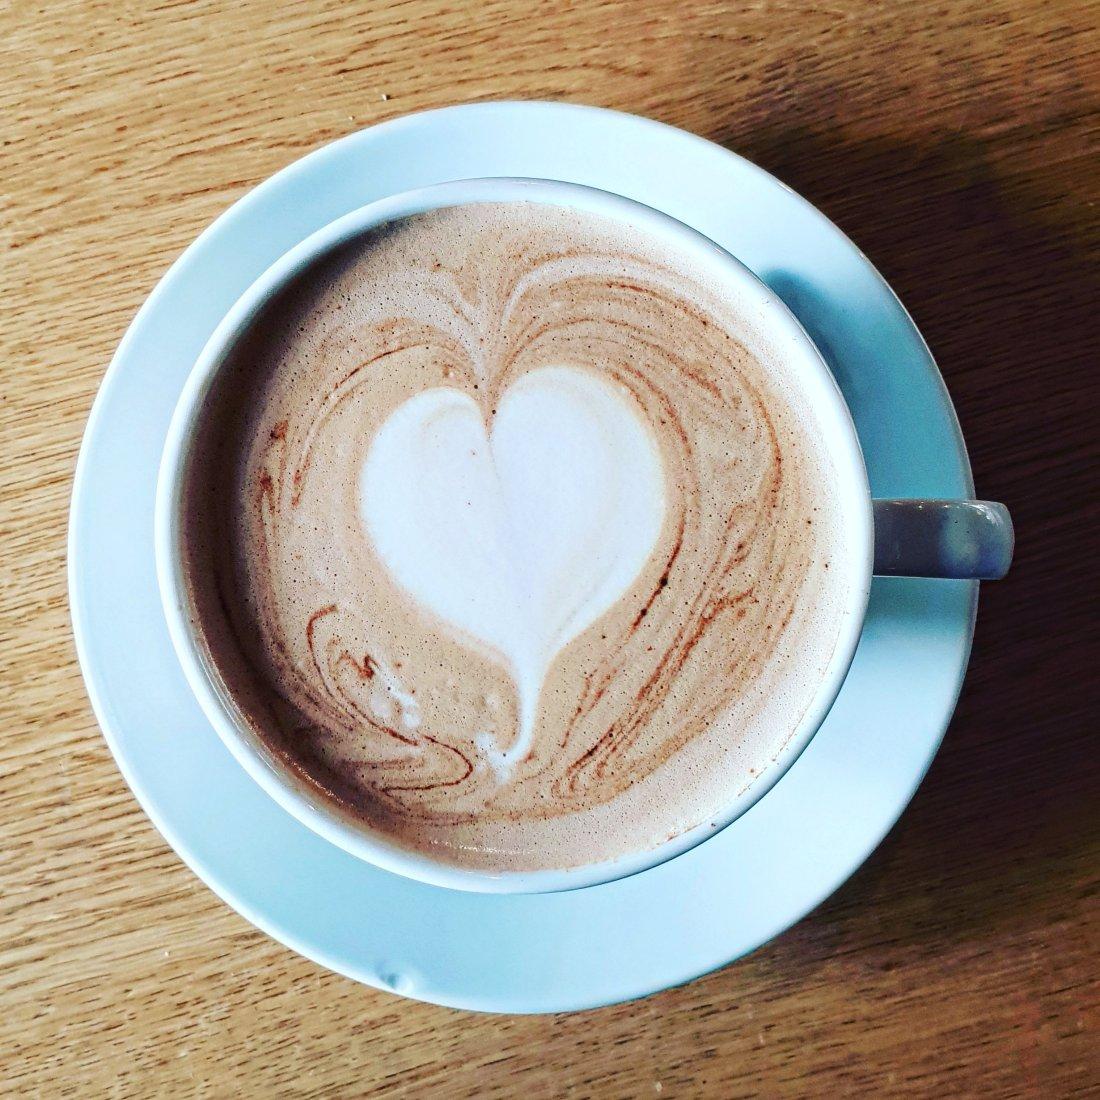 hosCarlos-kaffe.jpg